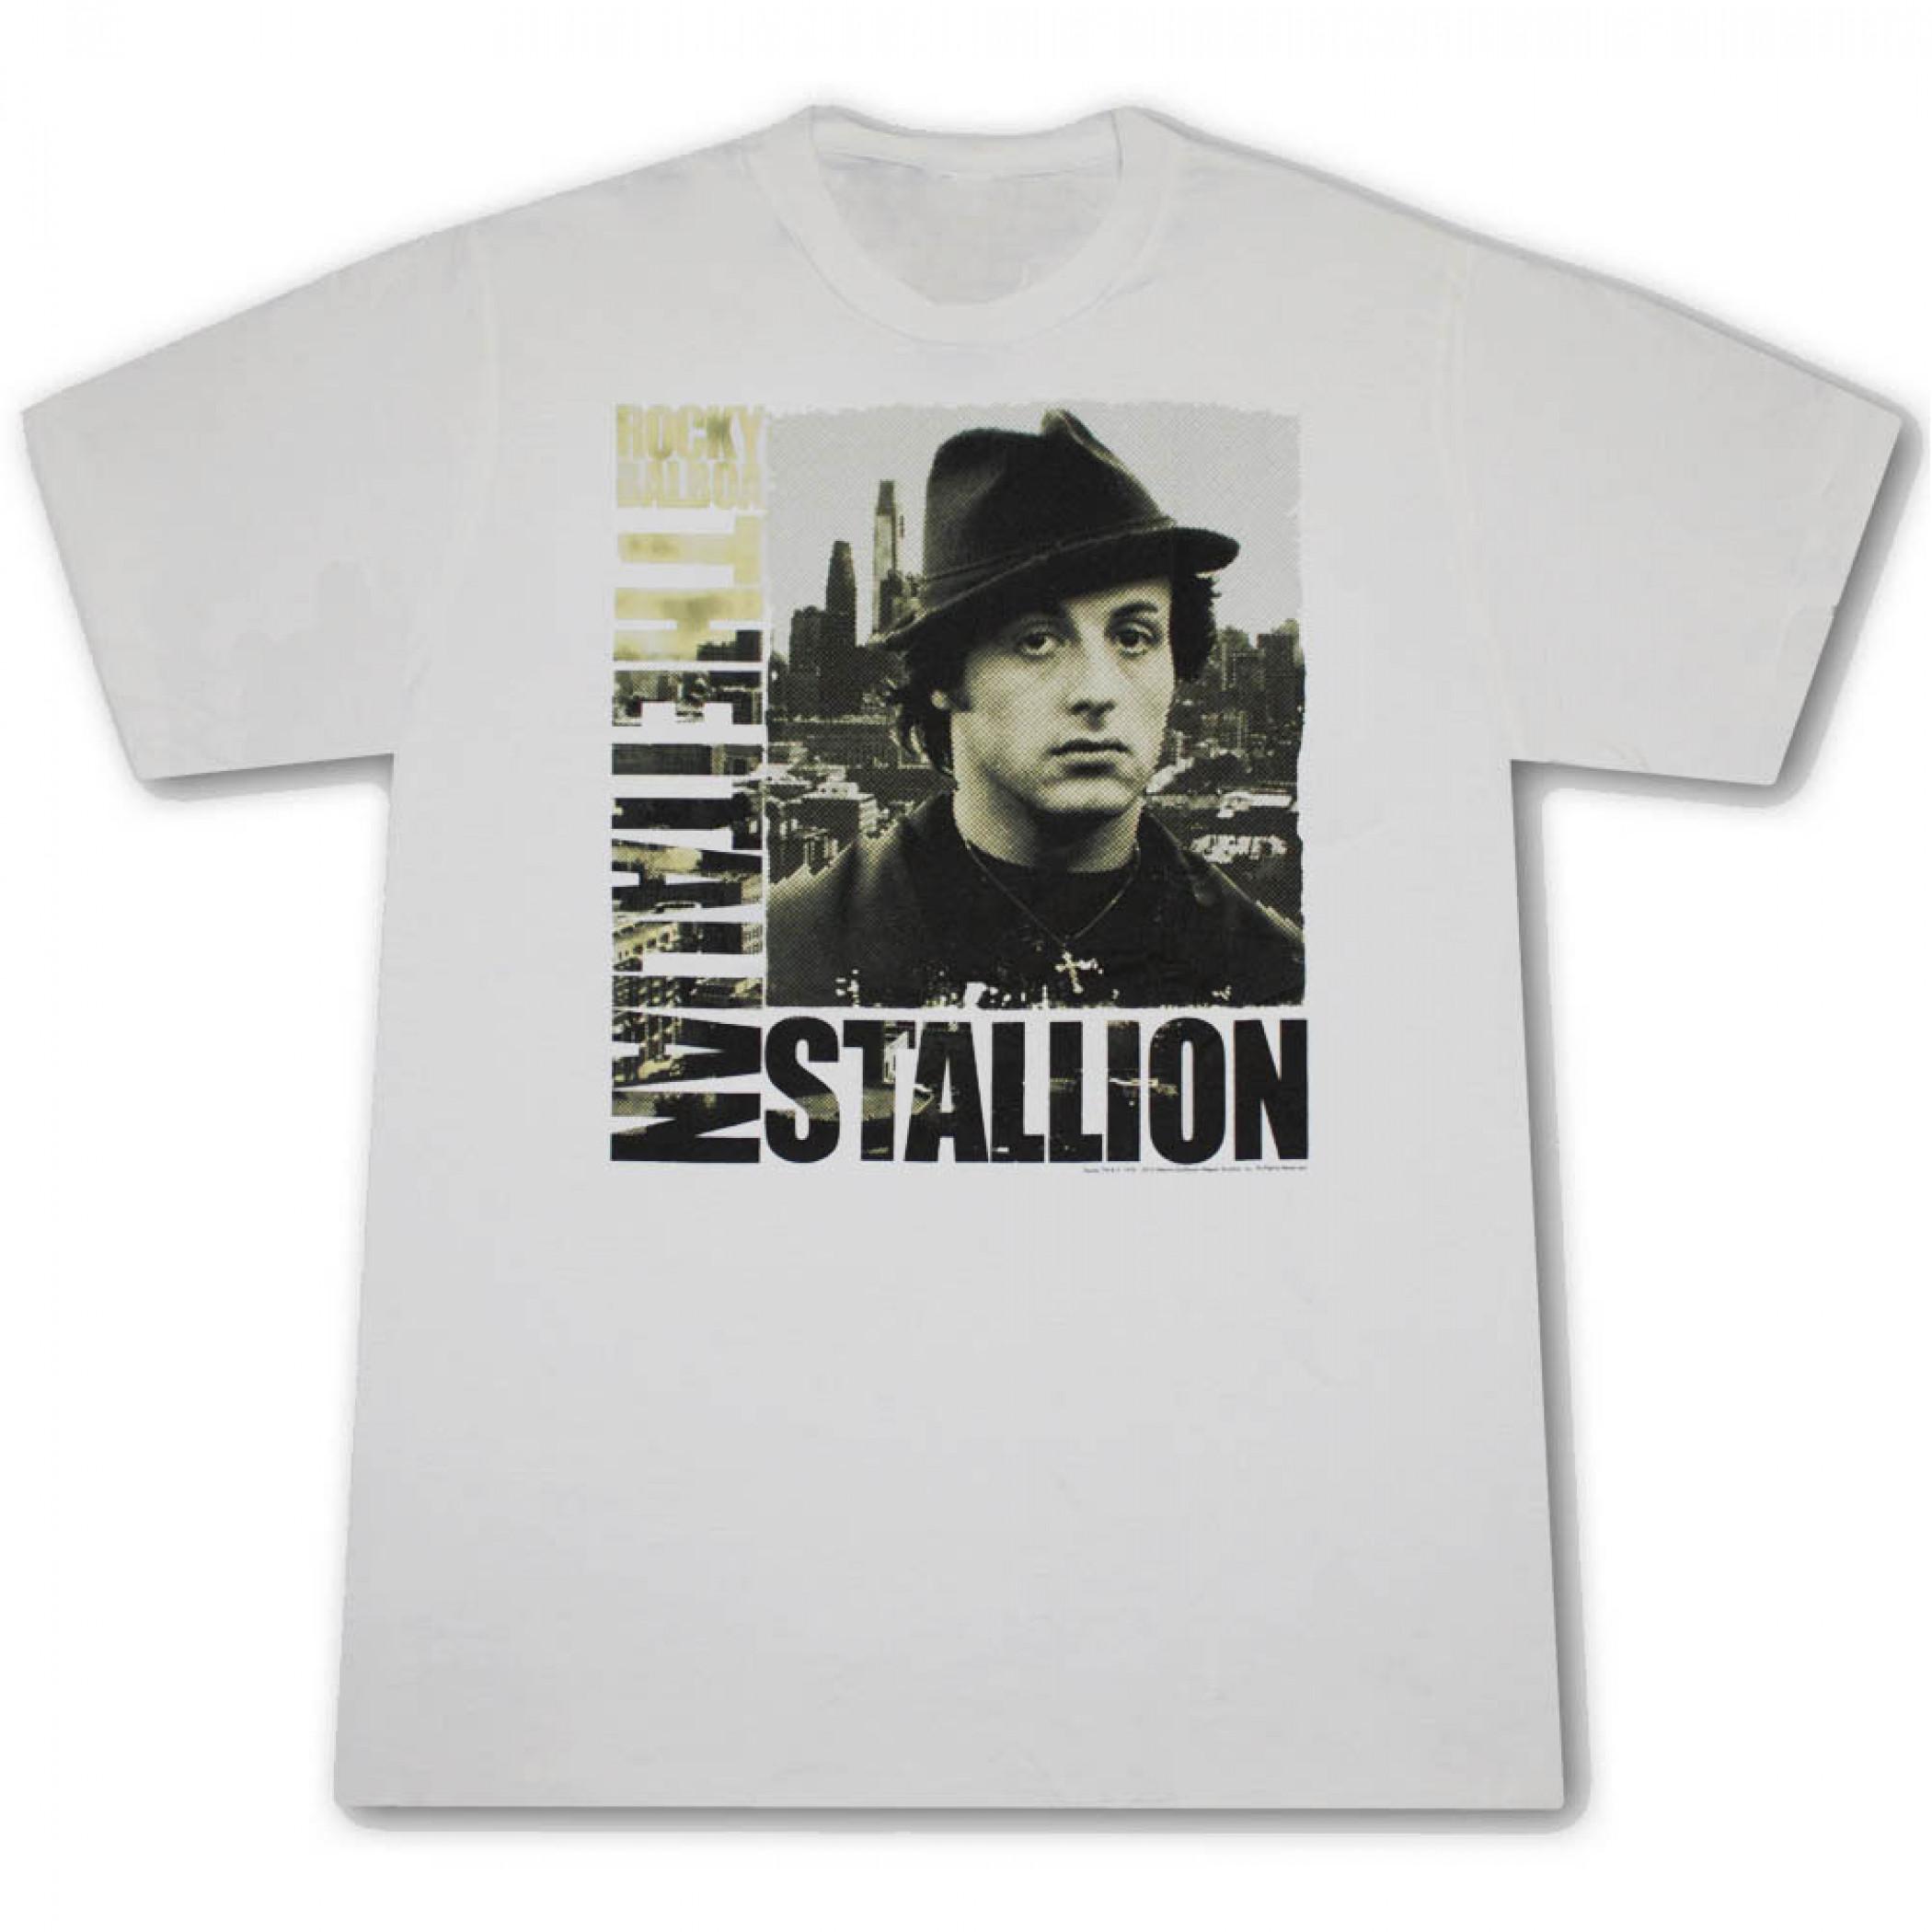 Rocky Balboa Italian Stallion City Grey Graphic Tee Shirt